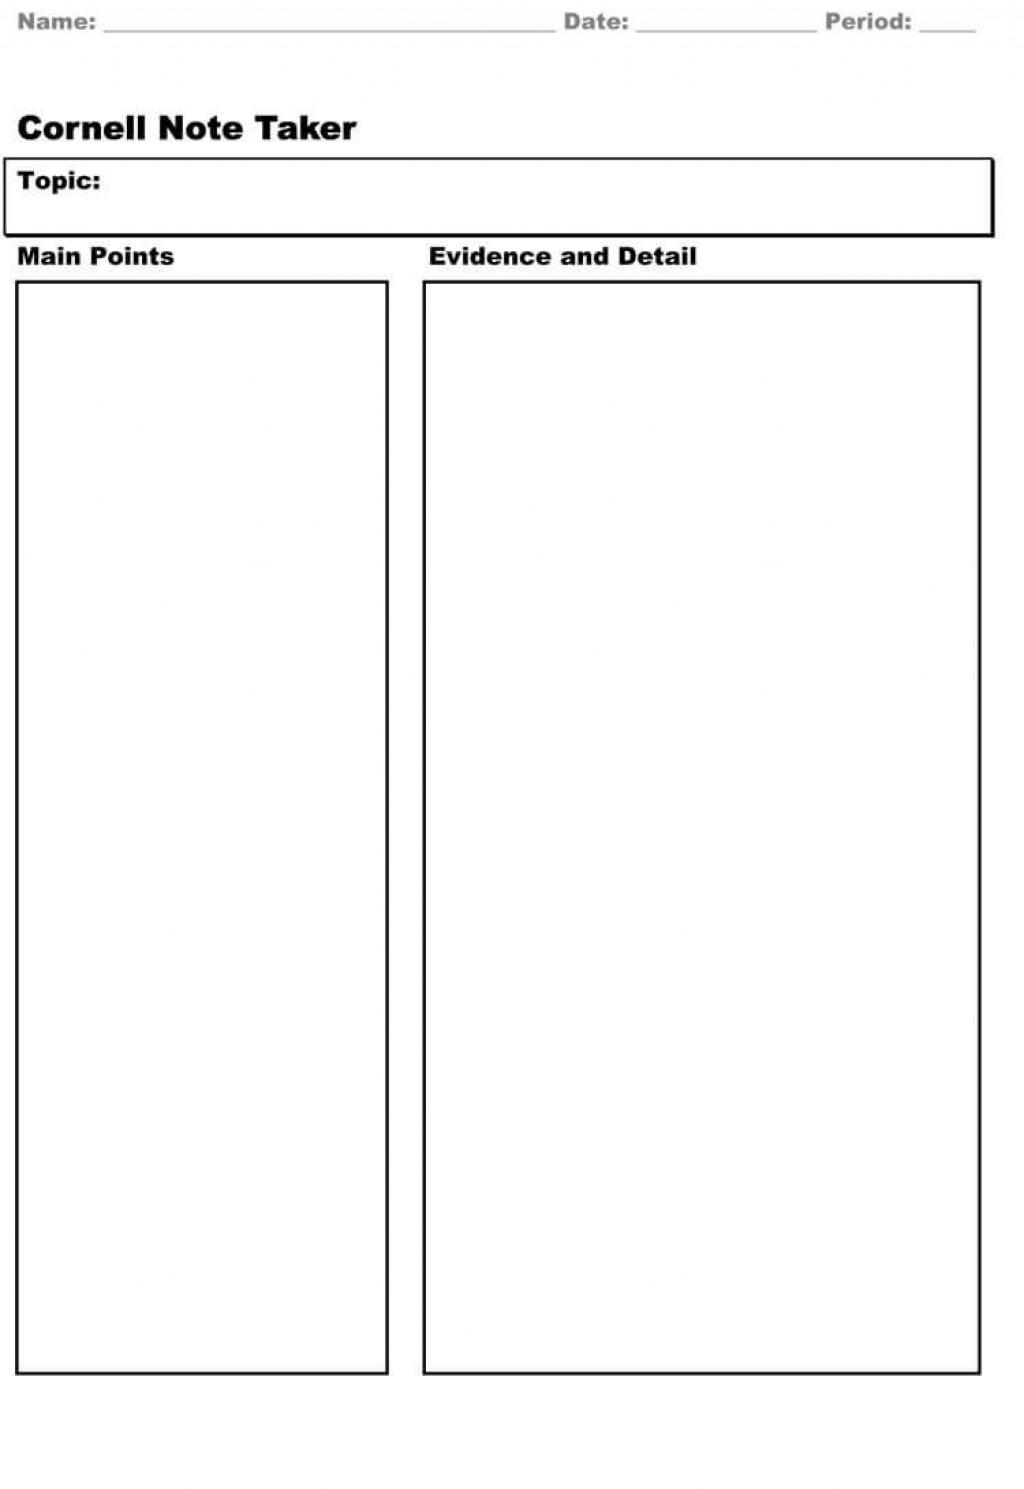 008 Fantastic Note Taking Template Pdf Idea  Free Cornell ExampleLarge